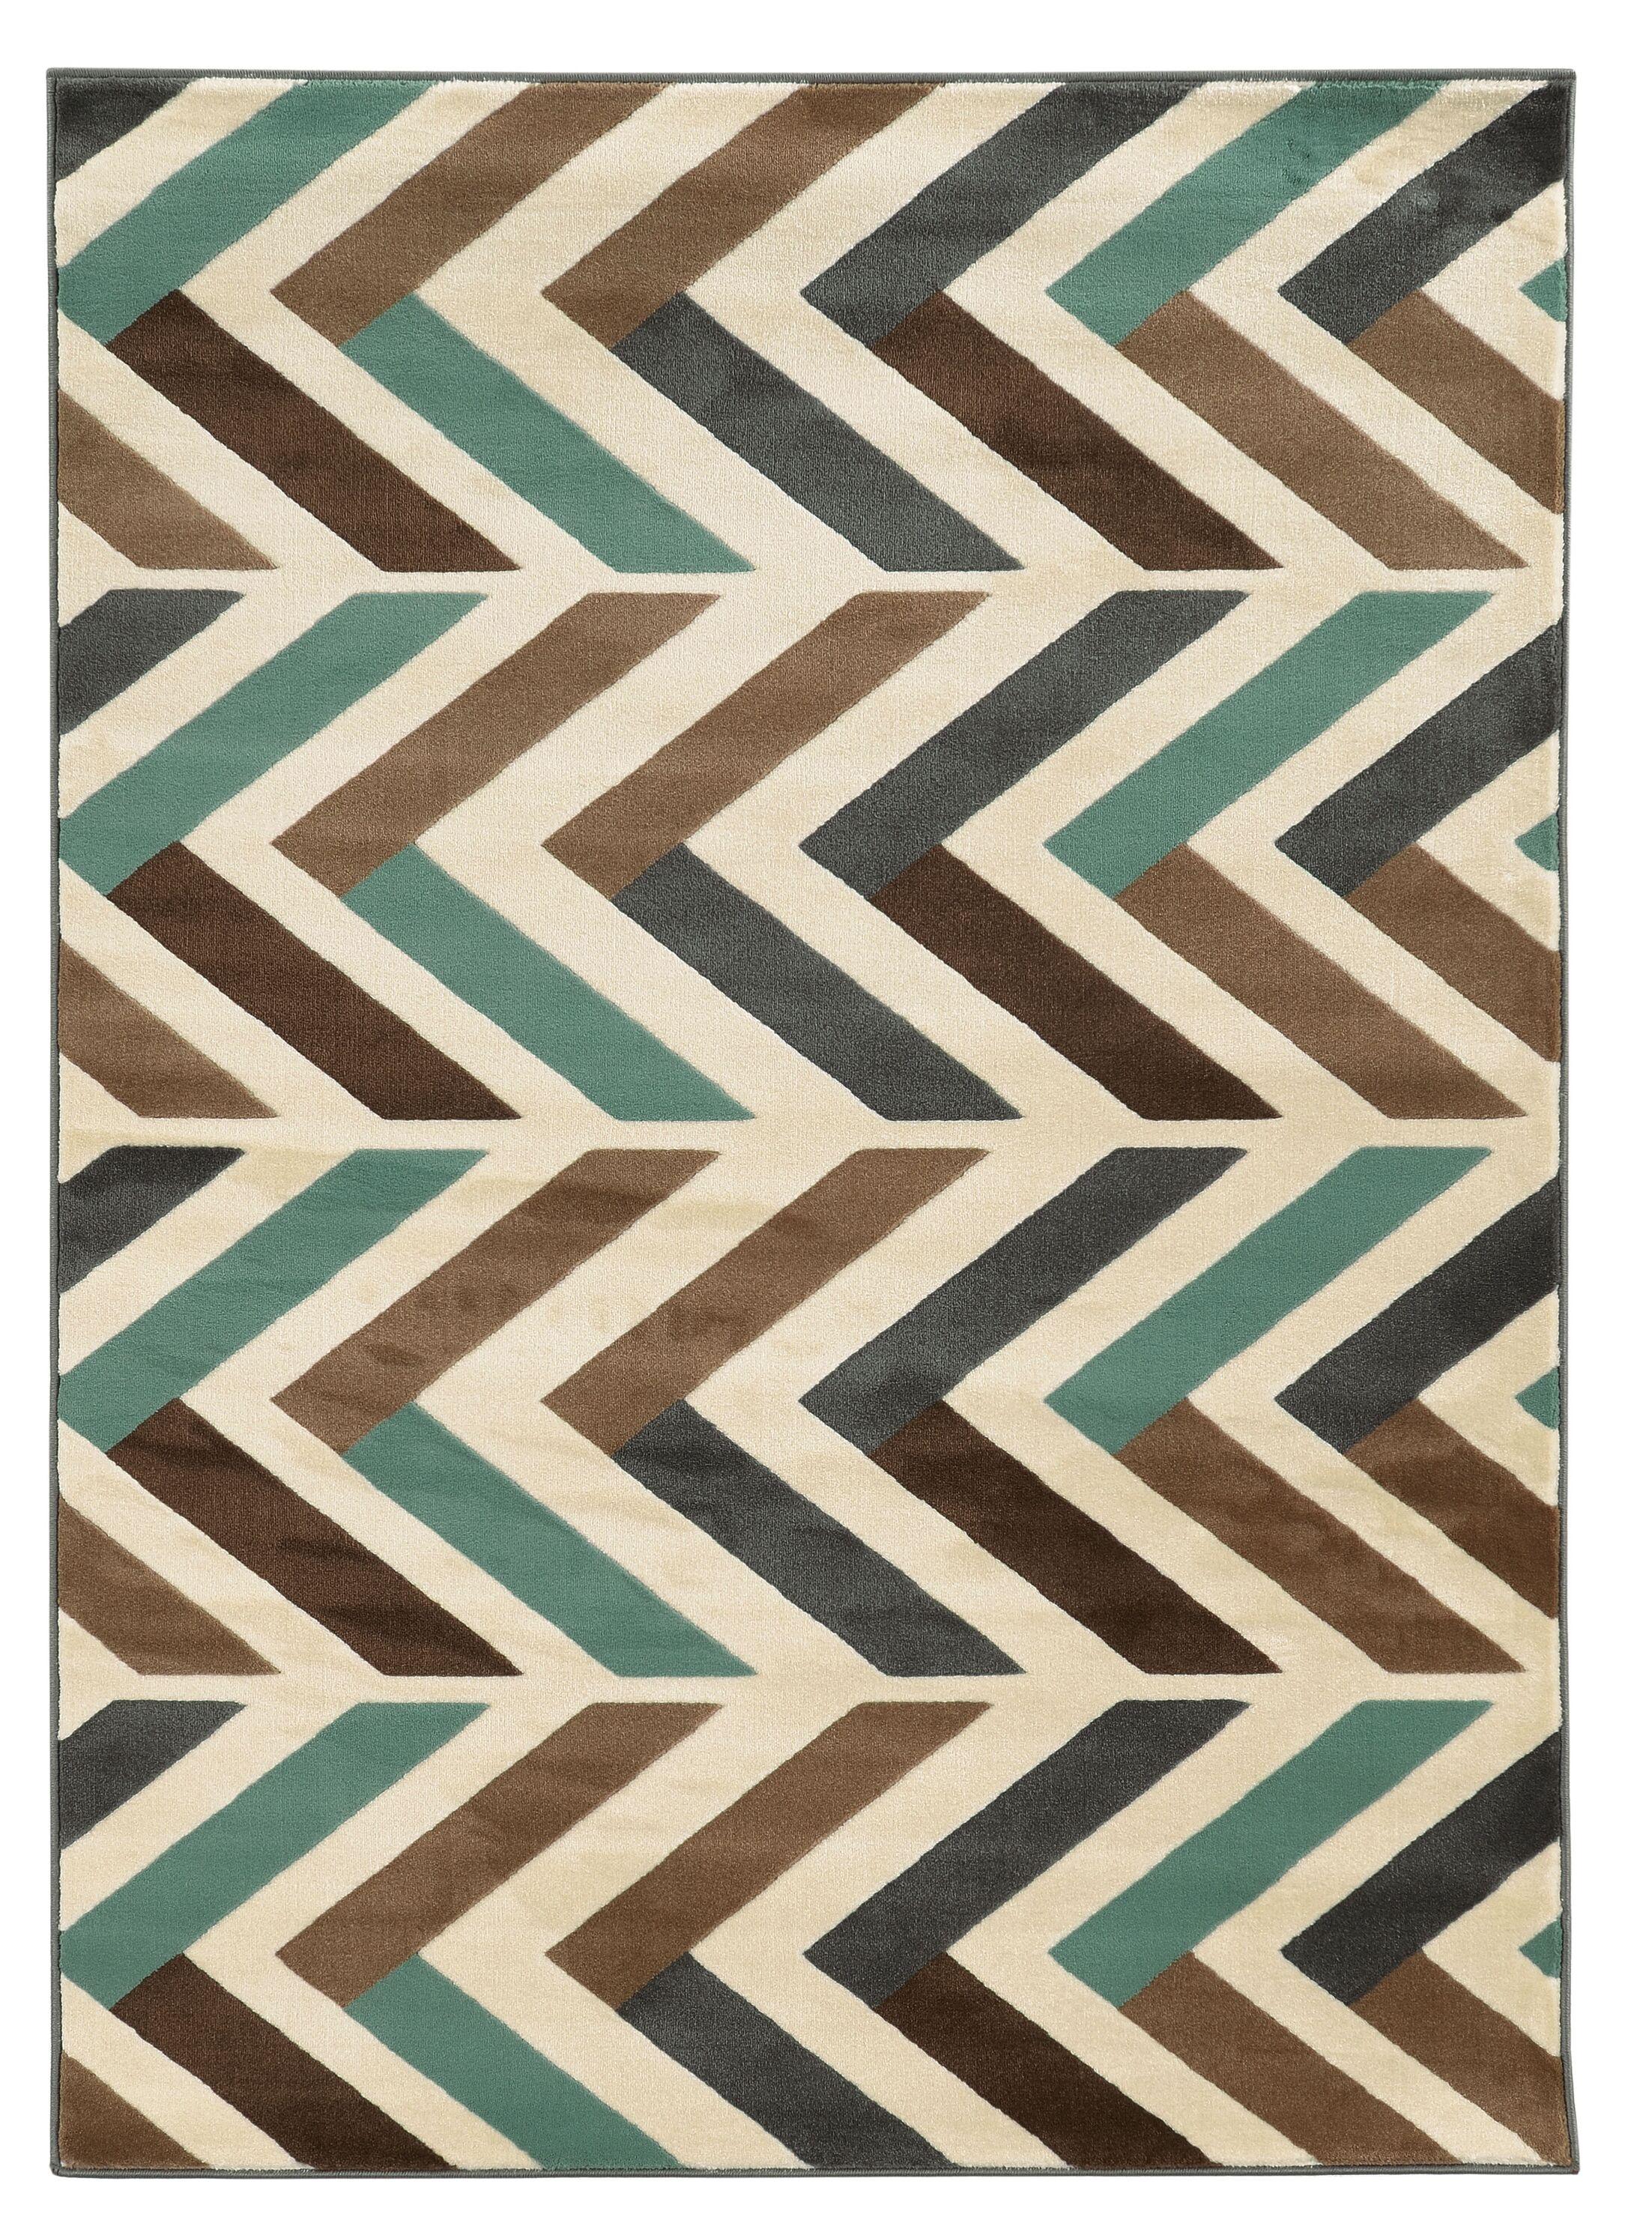 Halvard Ivory/Turquoise Area Rug Rug Size: Rectangle 5' x 7'